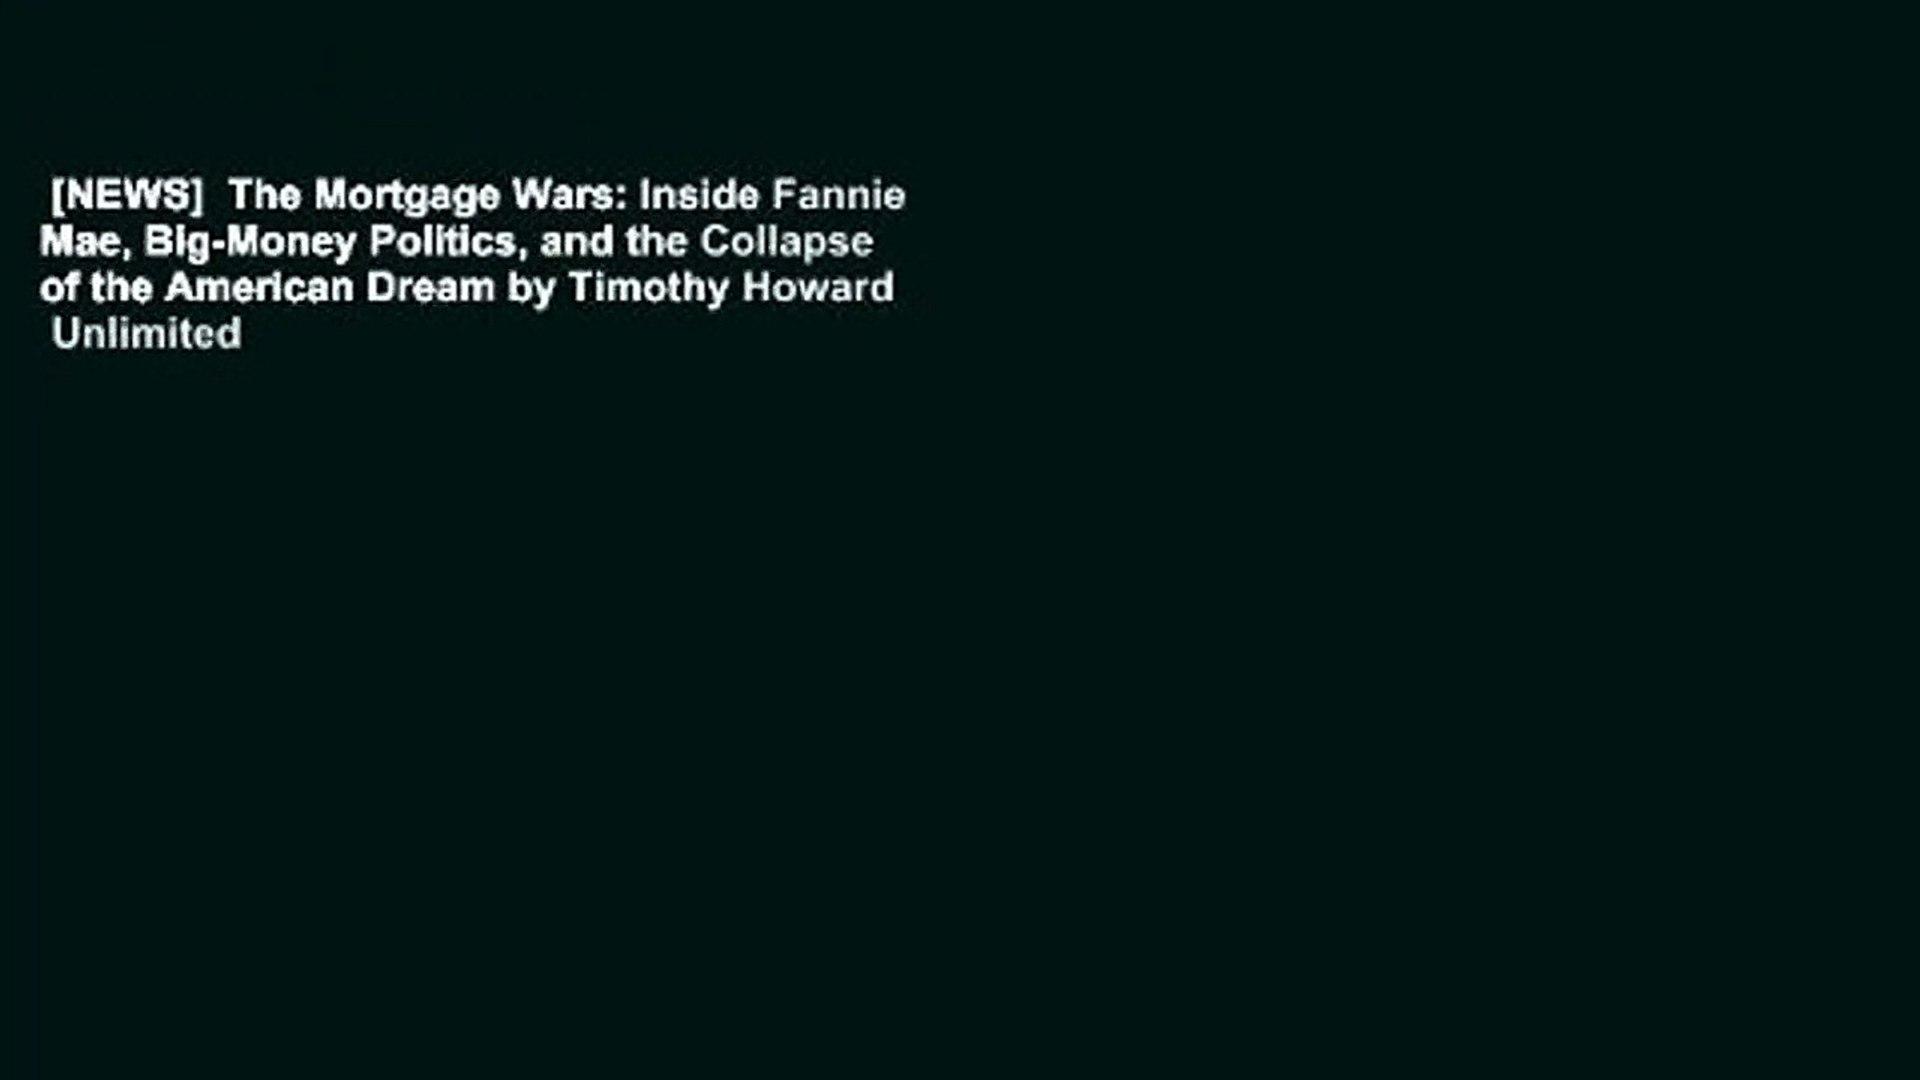 [NEWS]  The Mortgage Wars: Inside Fannie Mae, Big-Money Politics, and the